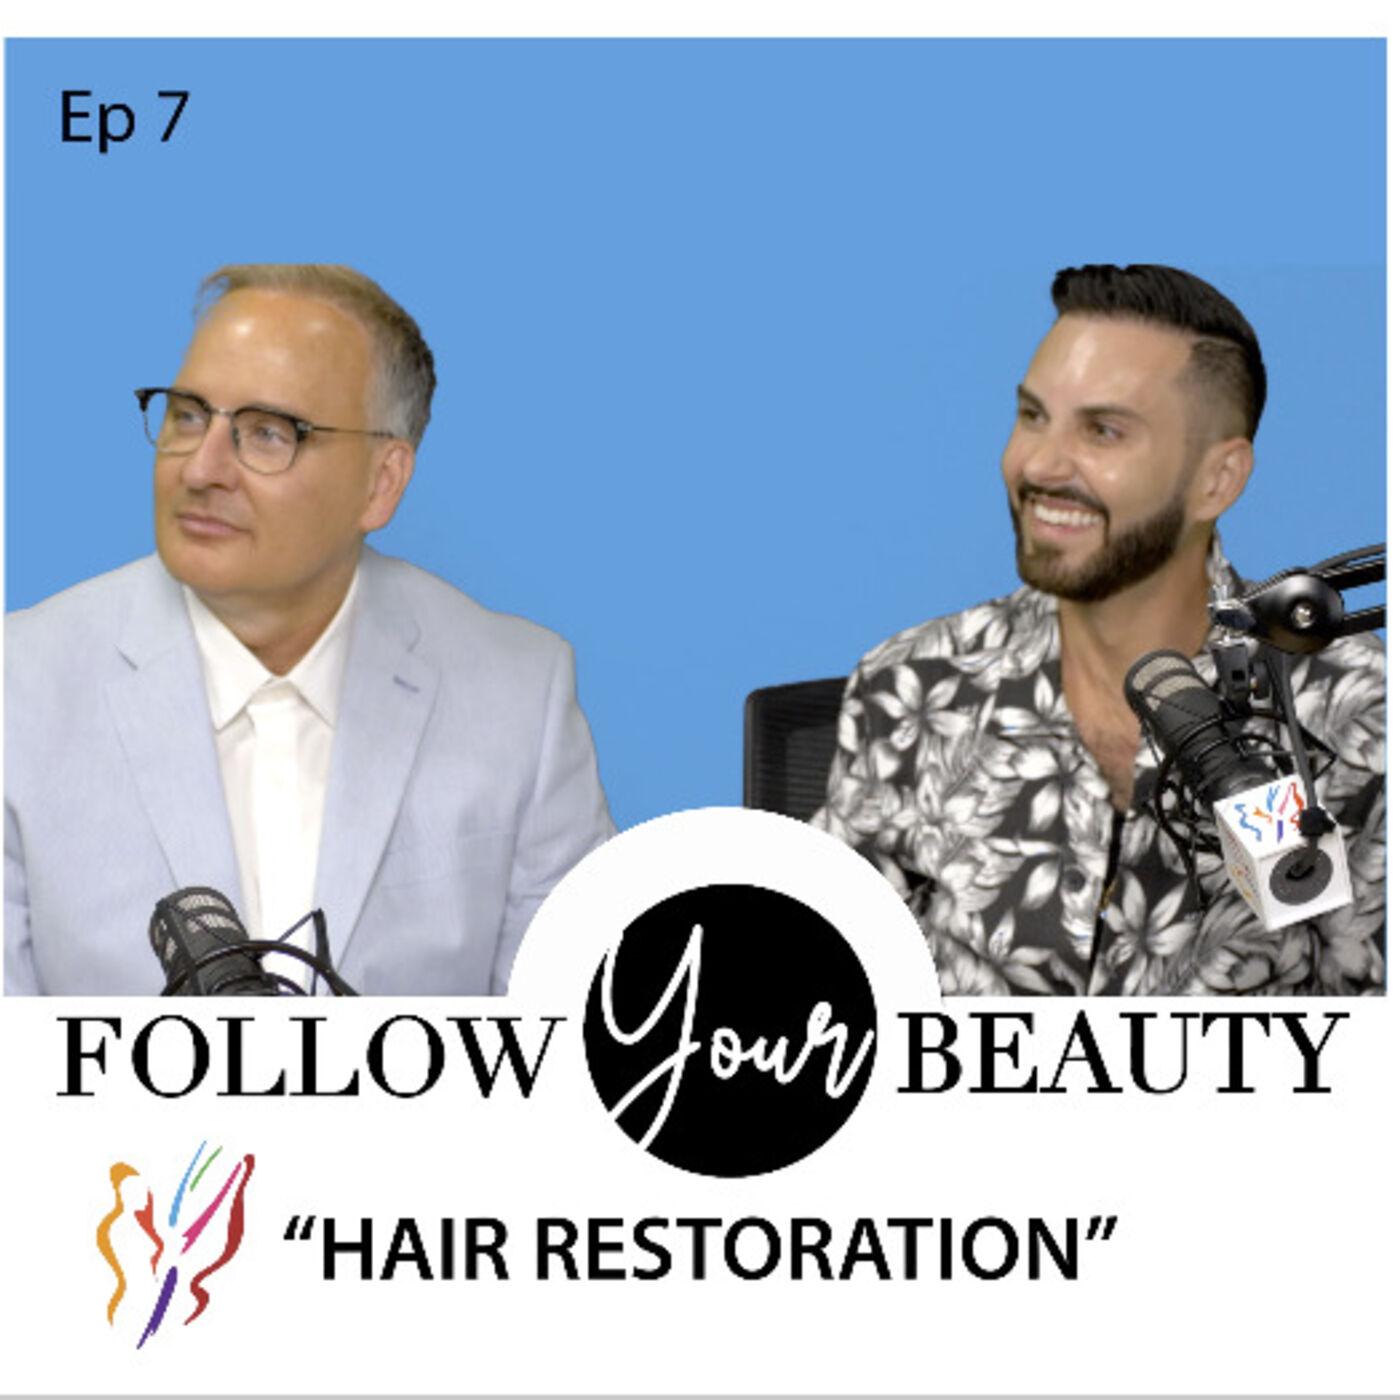 Follow Your Beauty - Hair Restoration with Mark & Josh